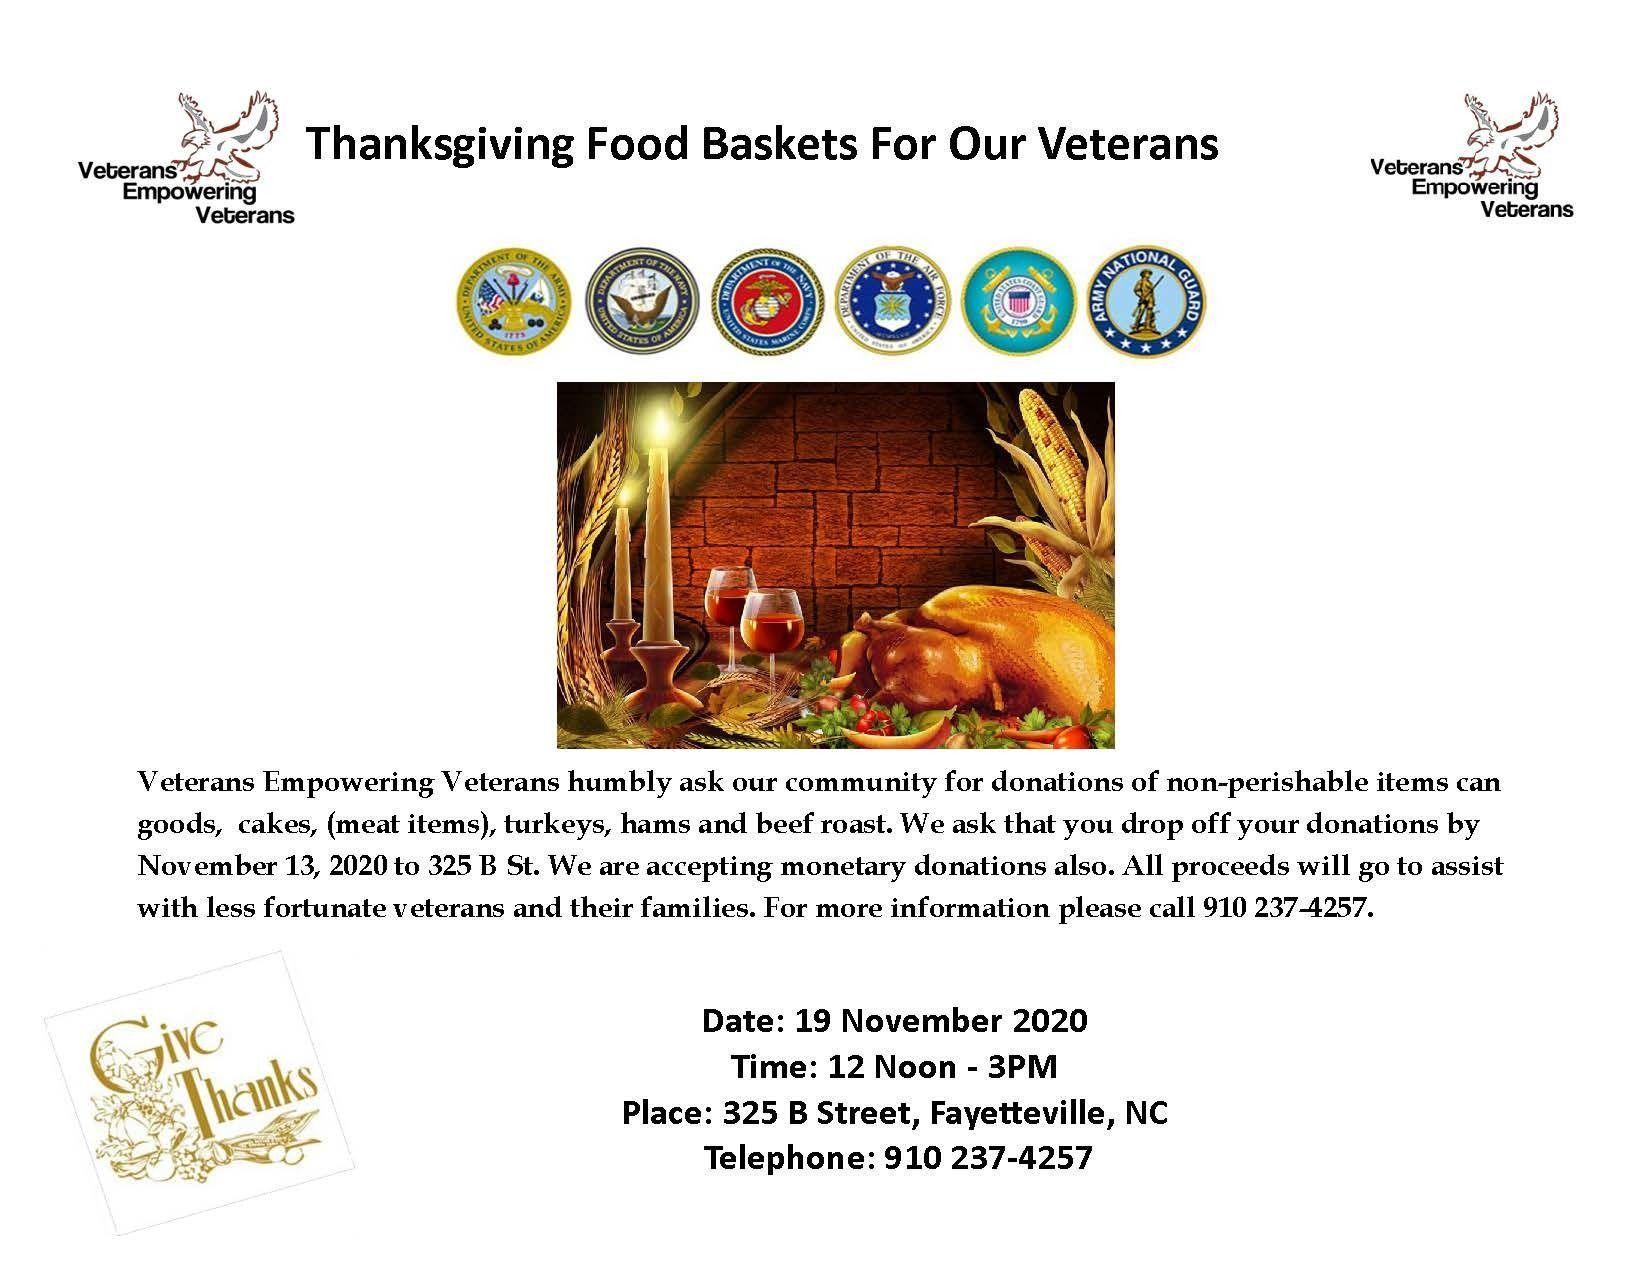 Veterans Empowering Veterans Seeking Donations